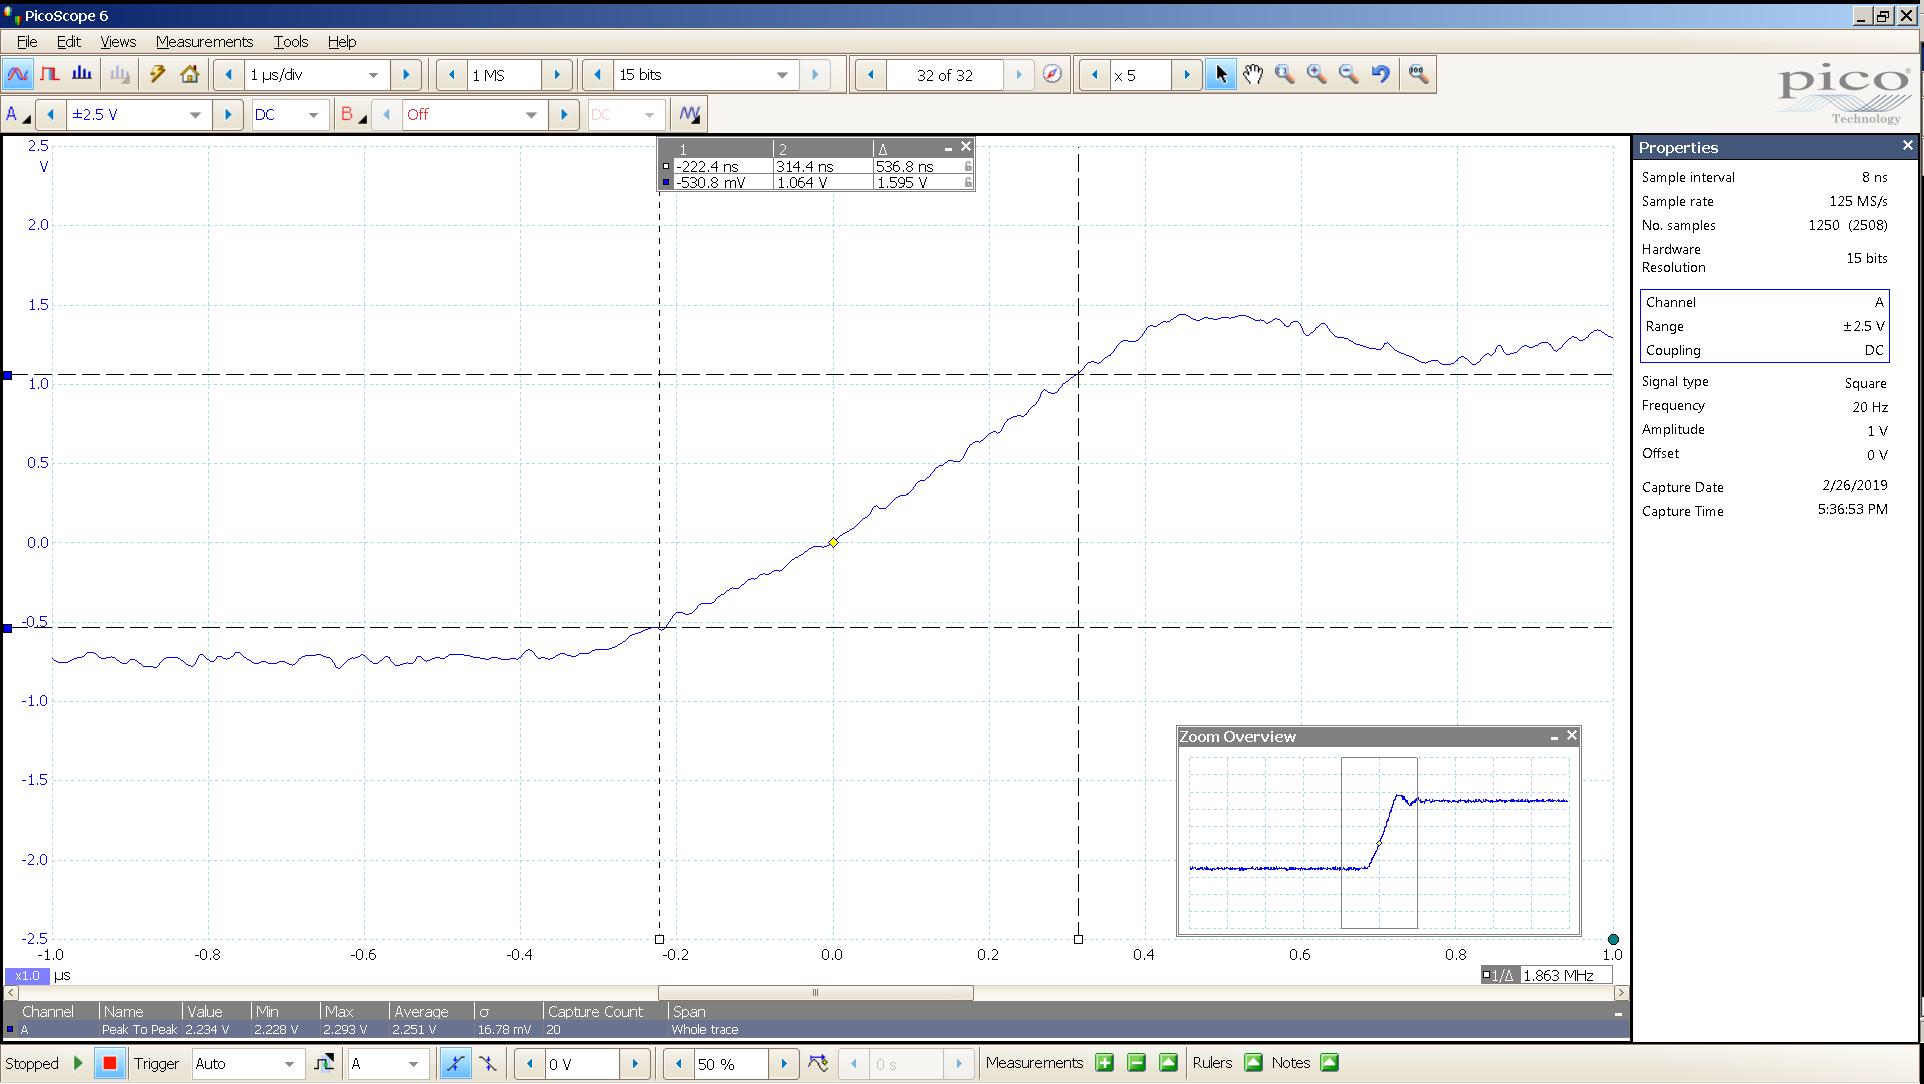 20190221 SigGen P20 20 Hz square 2000mVpp 1uS div 5MHz filter 30R - BW calc.png